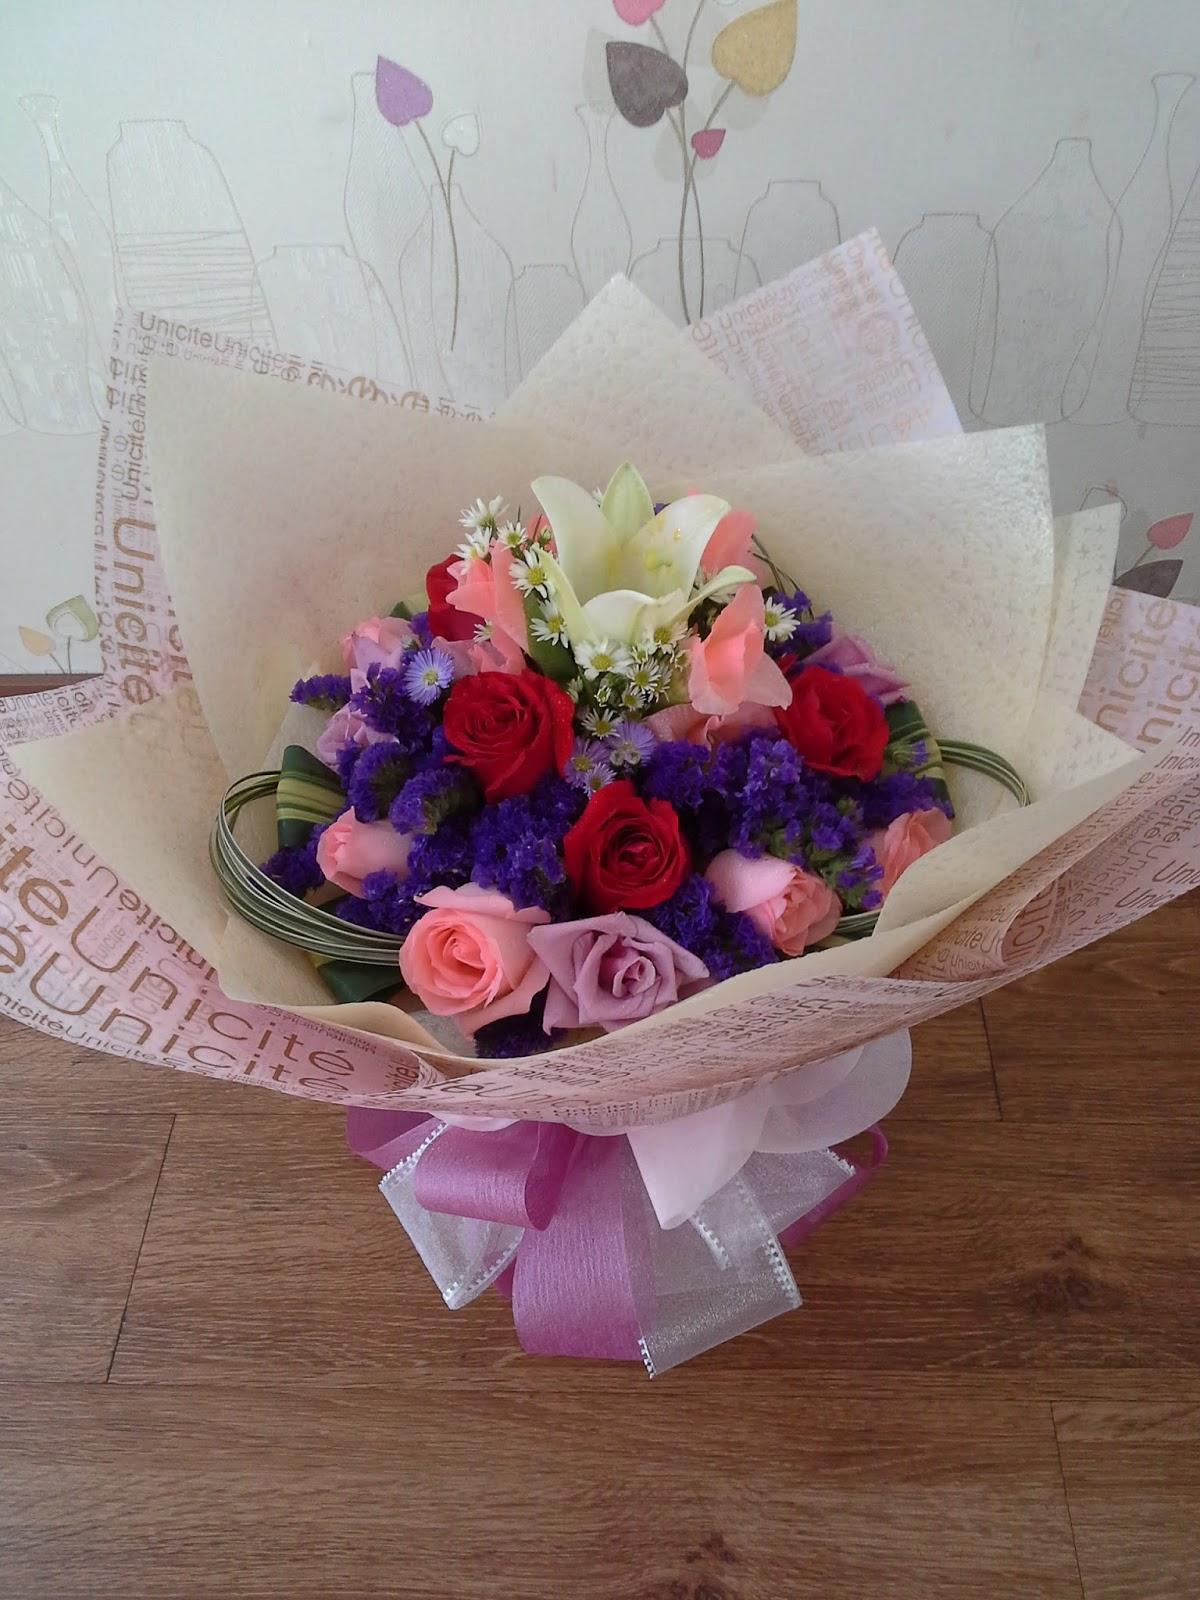 Ipoh florist yen floral053120394 47lebuh lapangan siber 1bandar fresh flowers handbouquet design izmirmasajfo